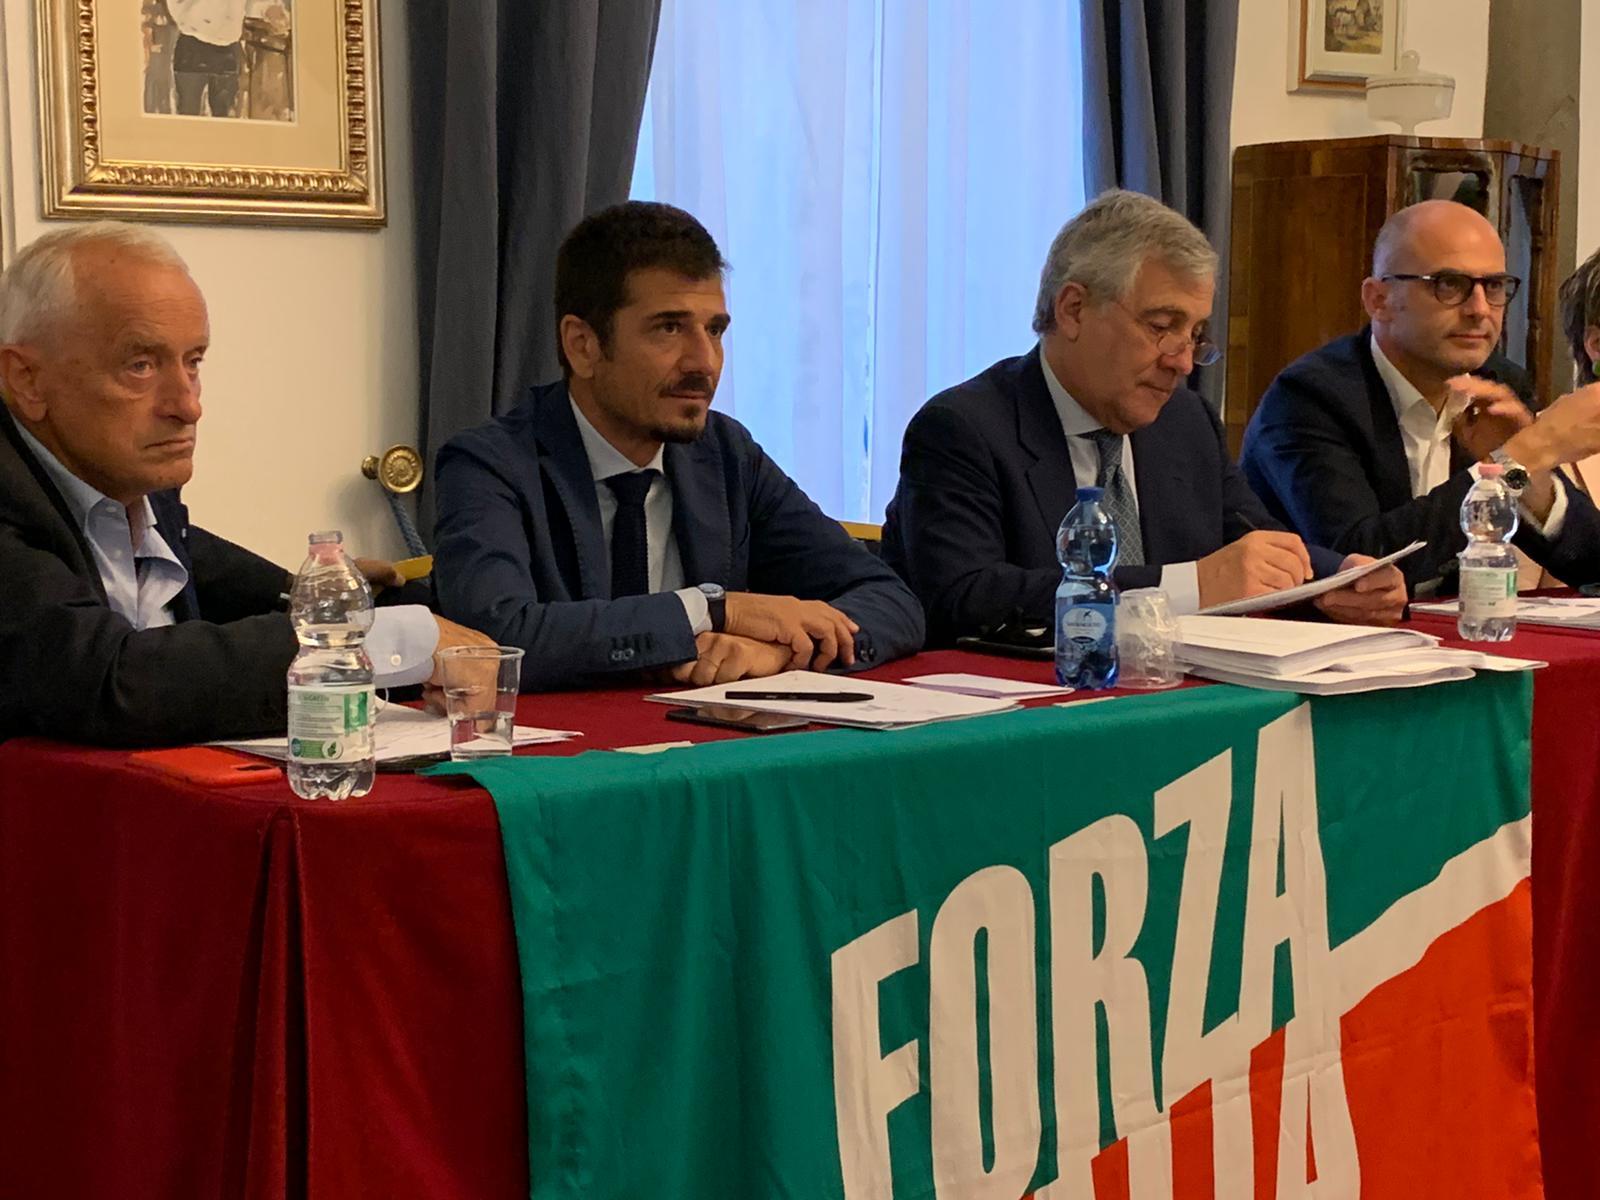 Antonio Tajani Firenze